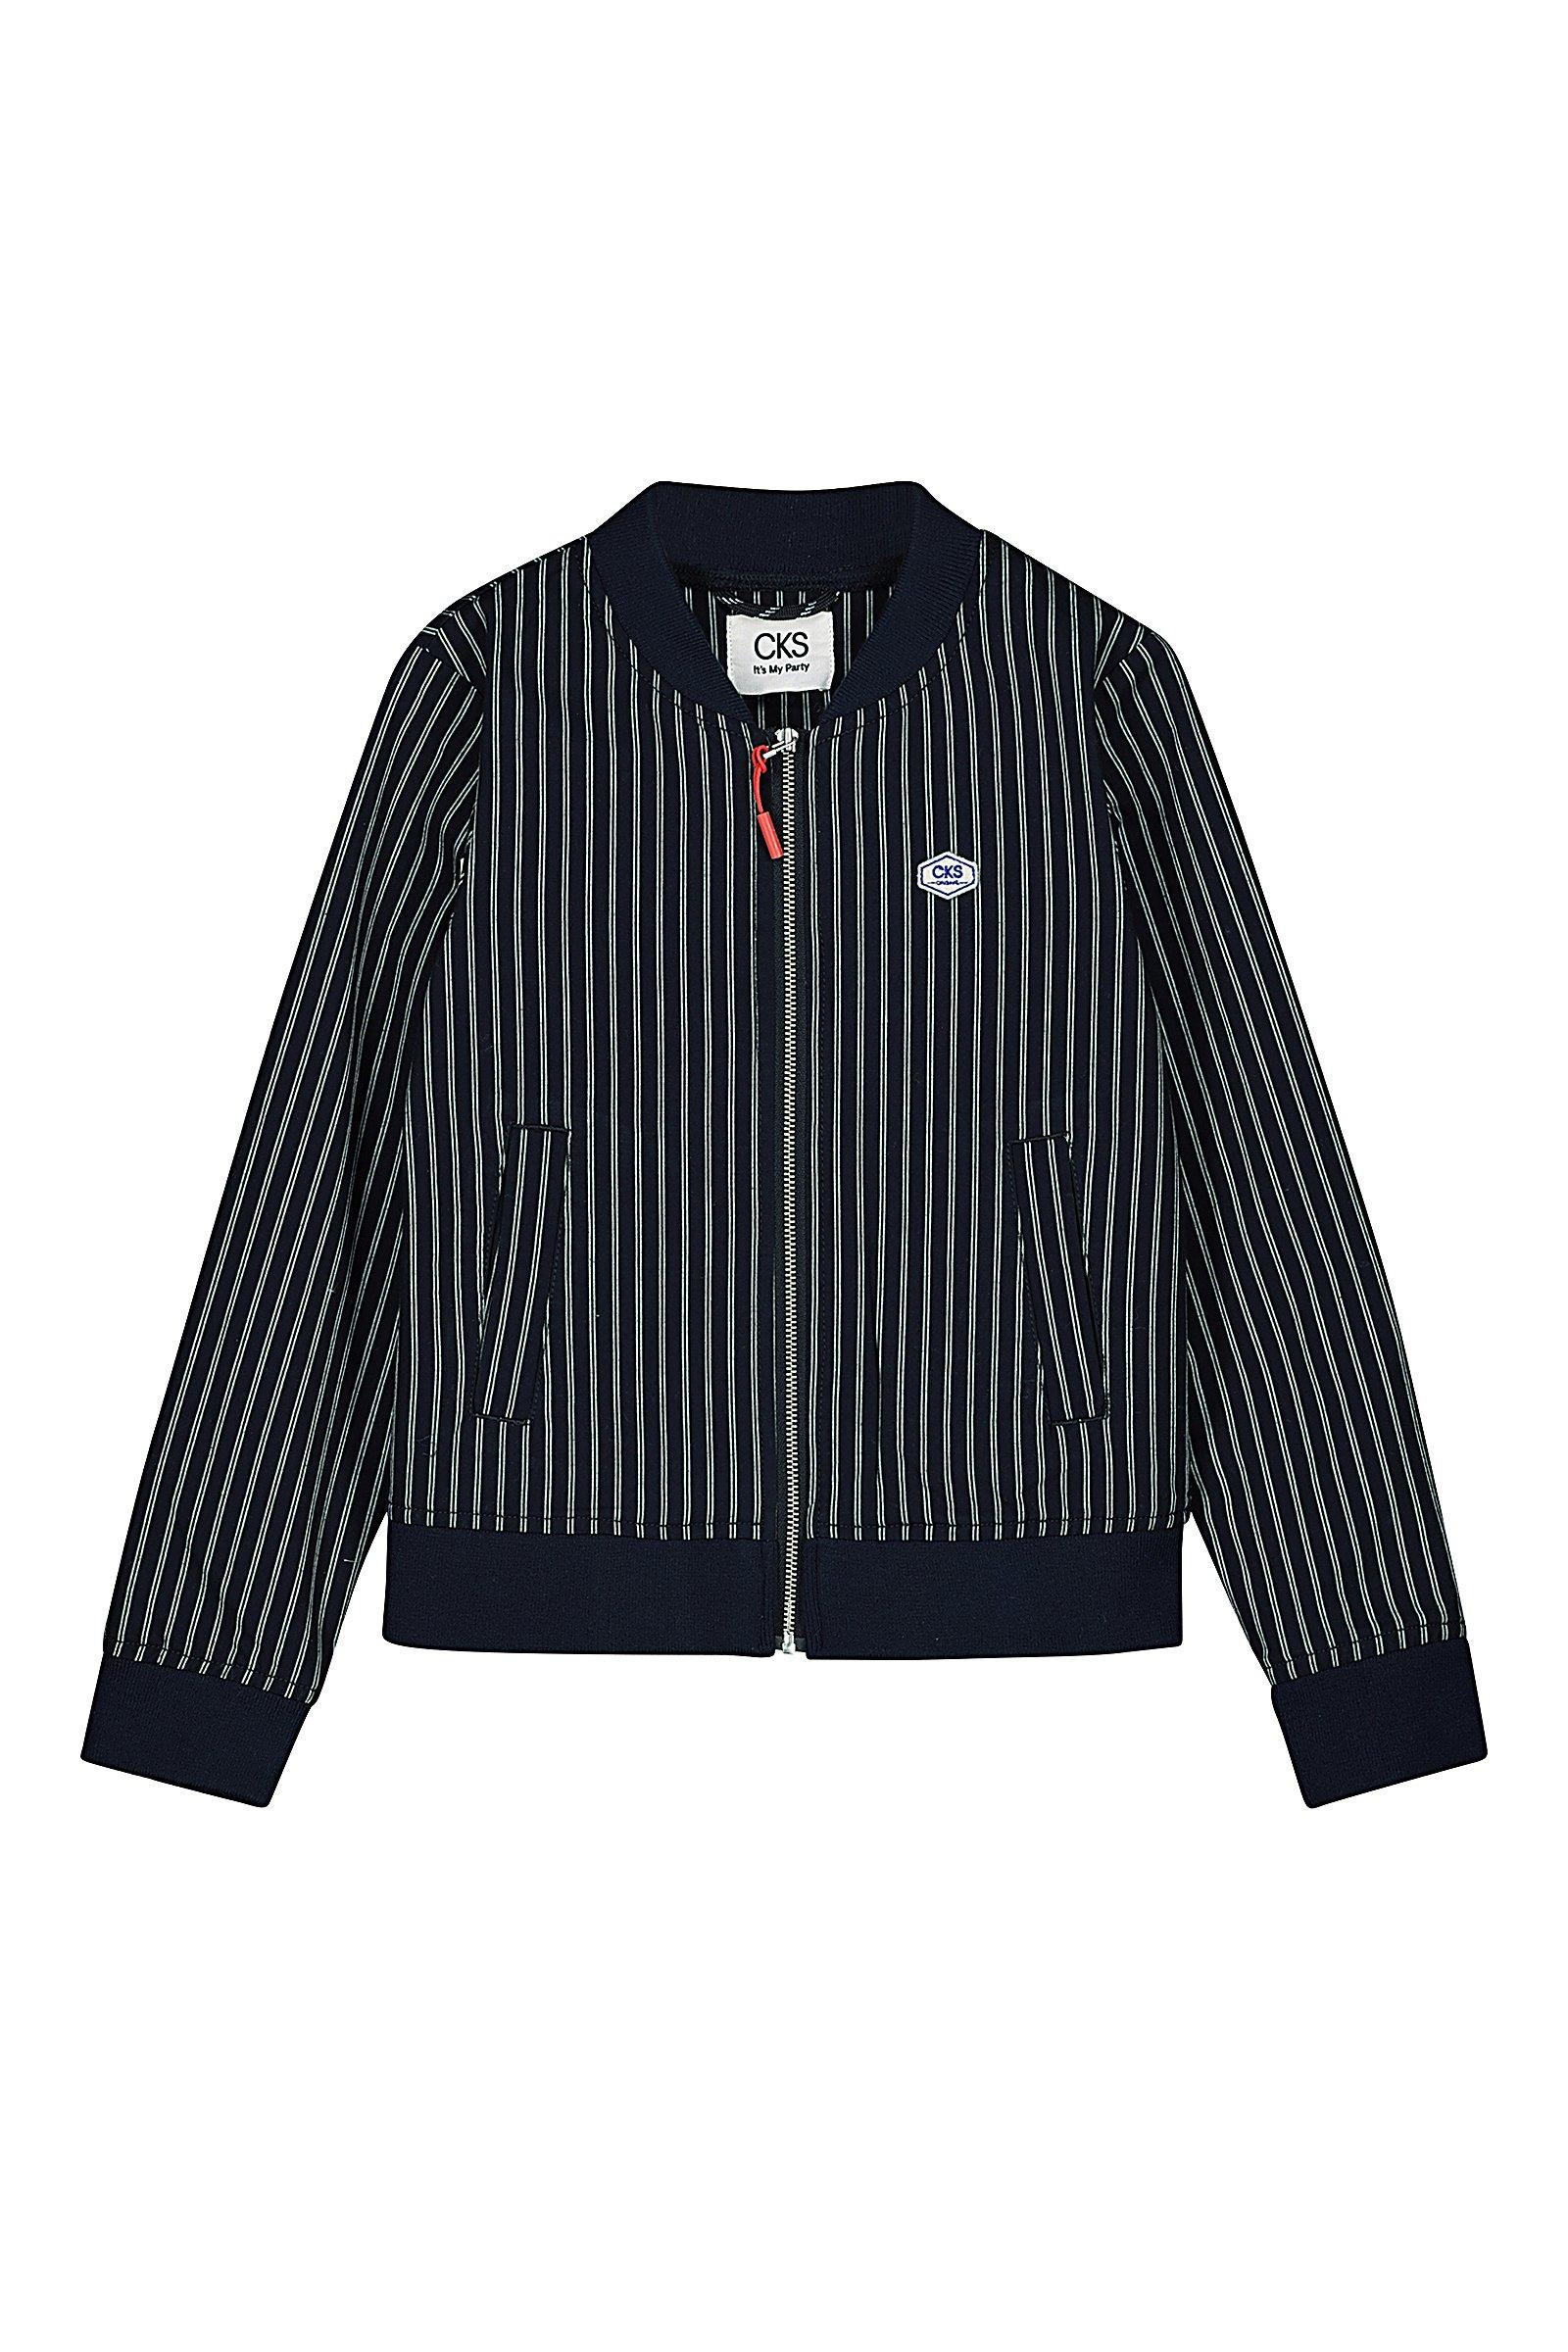 https://webmedia.cks-fashion.com/i/cks/123031BLM_50_l